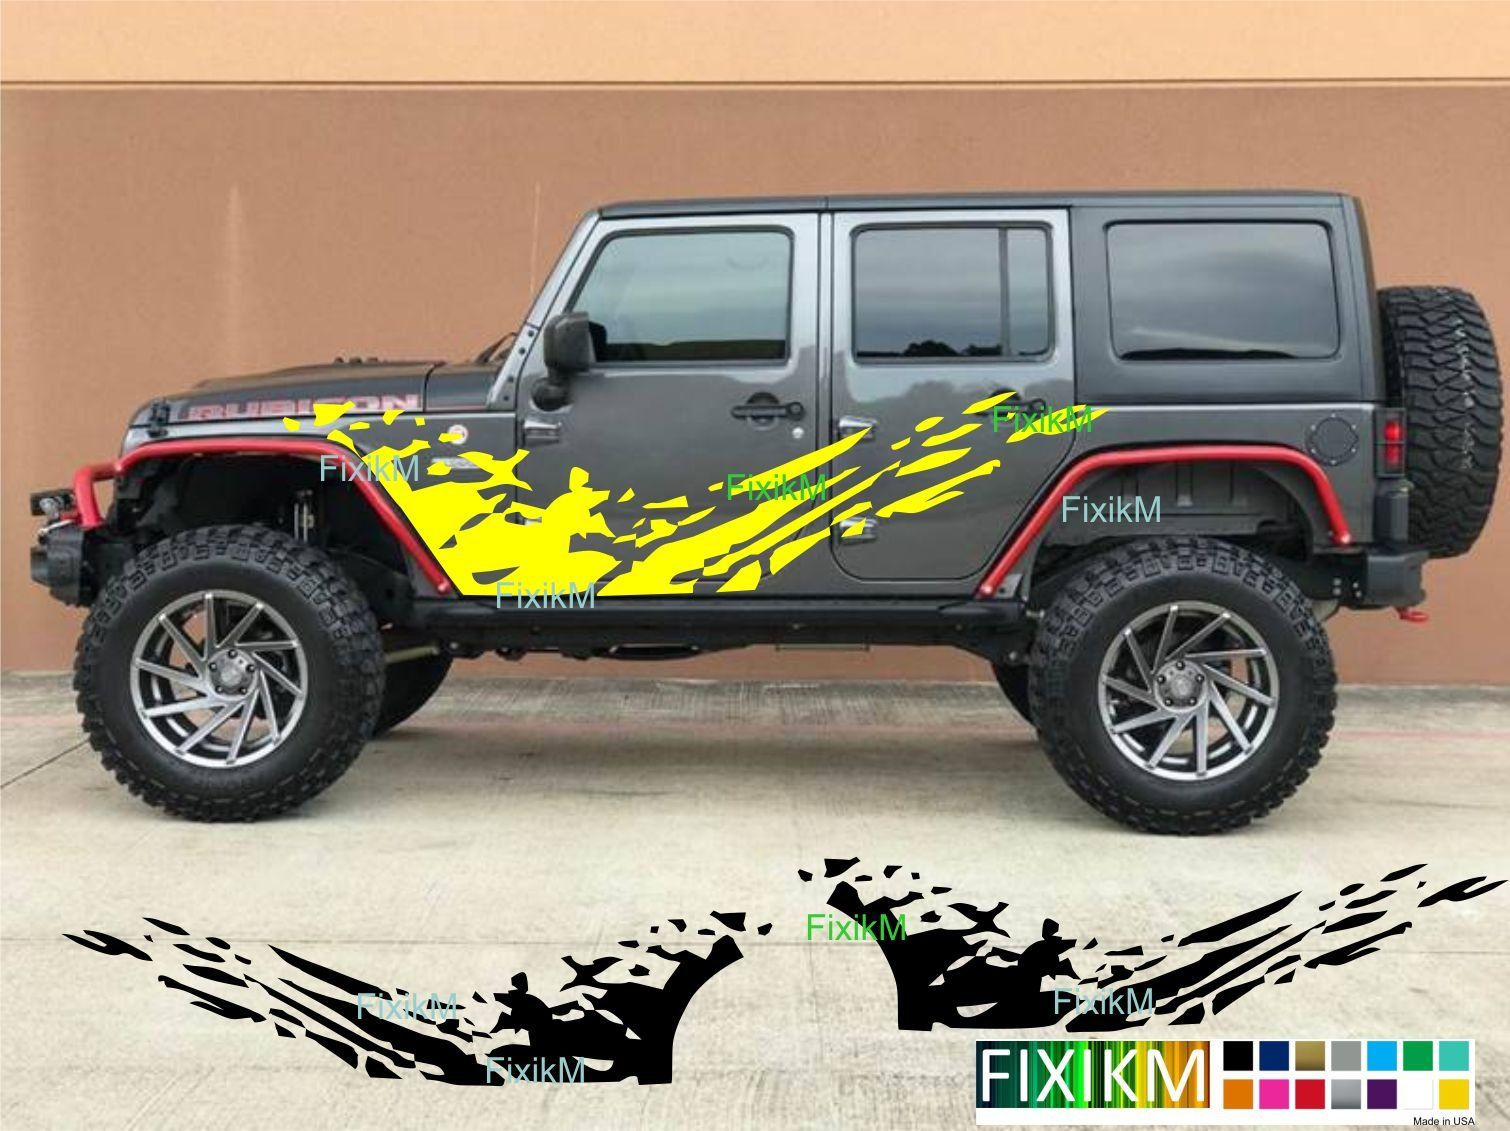 Mud Splash Side Graphics Vinyl Decal Stickers Universal Size Etsy Jeep Wrangler Accessories Jeep Decals Wrangler Accessories